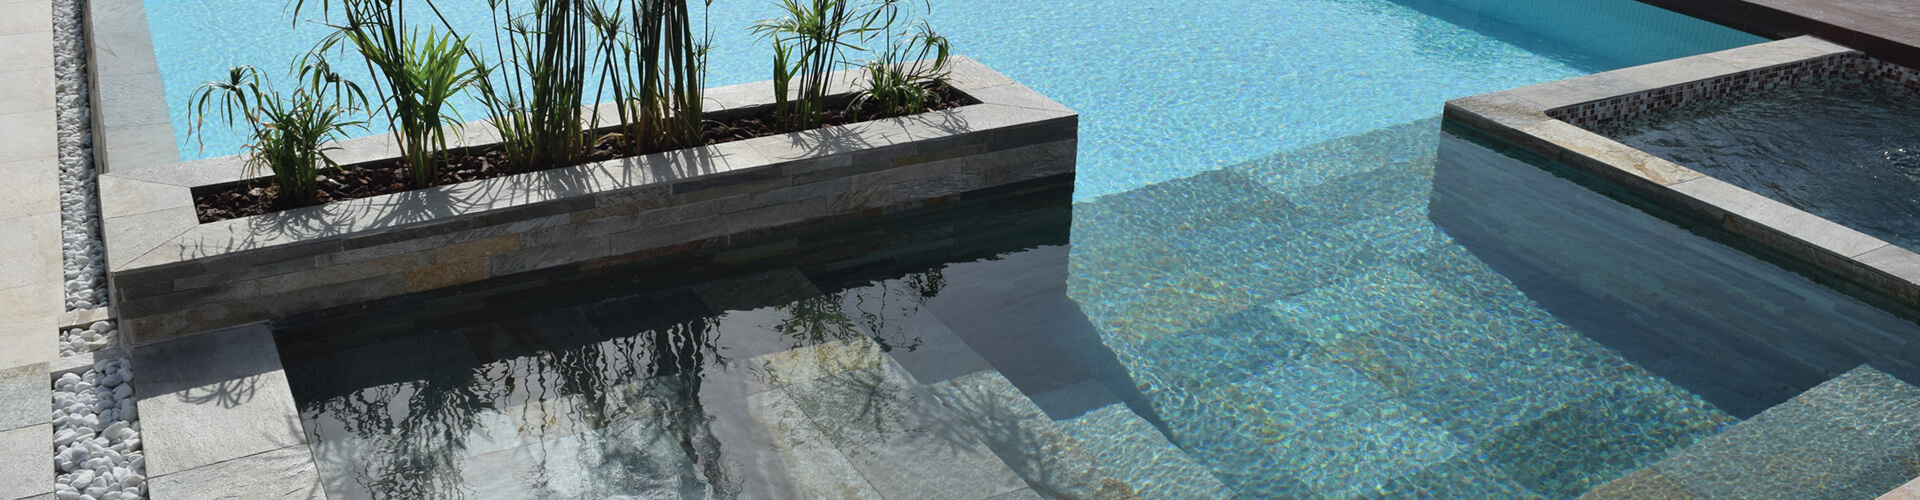 artesia-kolekcije-vodni-svet-slider